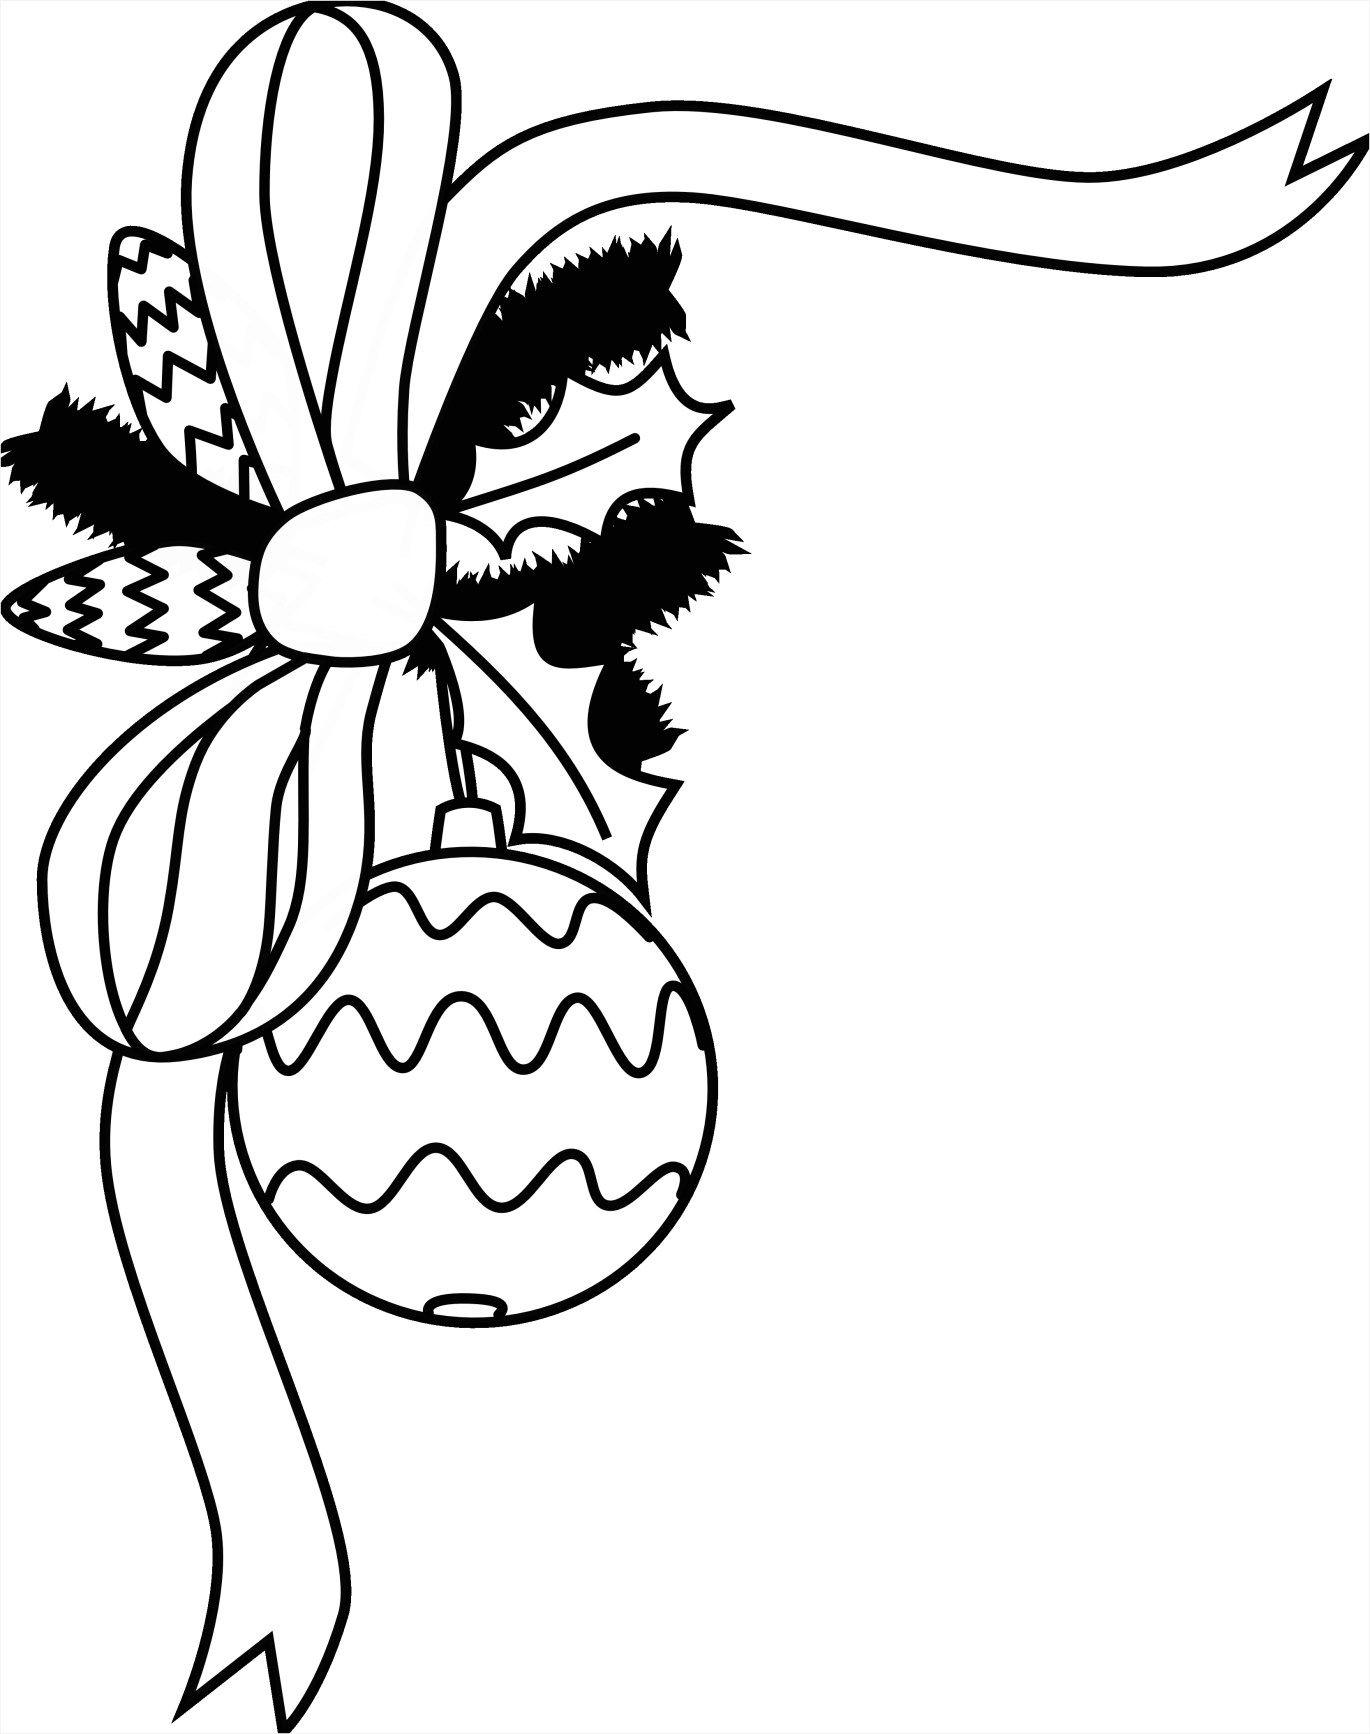 41 Beautiful Black And White Christmas Decor Ideas Homenthusiastic Christmas Present Clip Art Christmas Images Clip Art Christmas Clipart Christmas clip art black and white cool